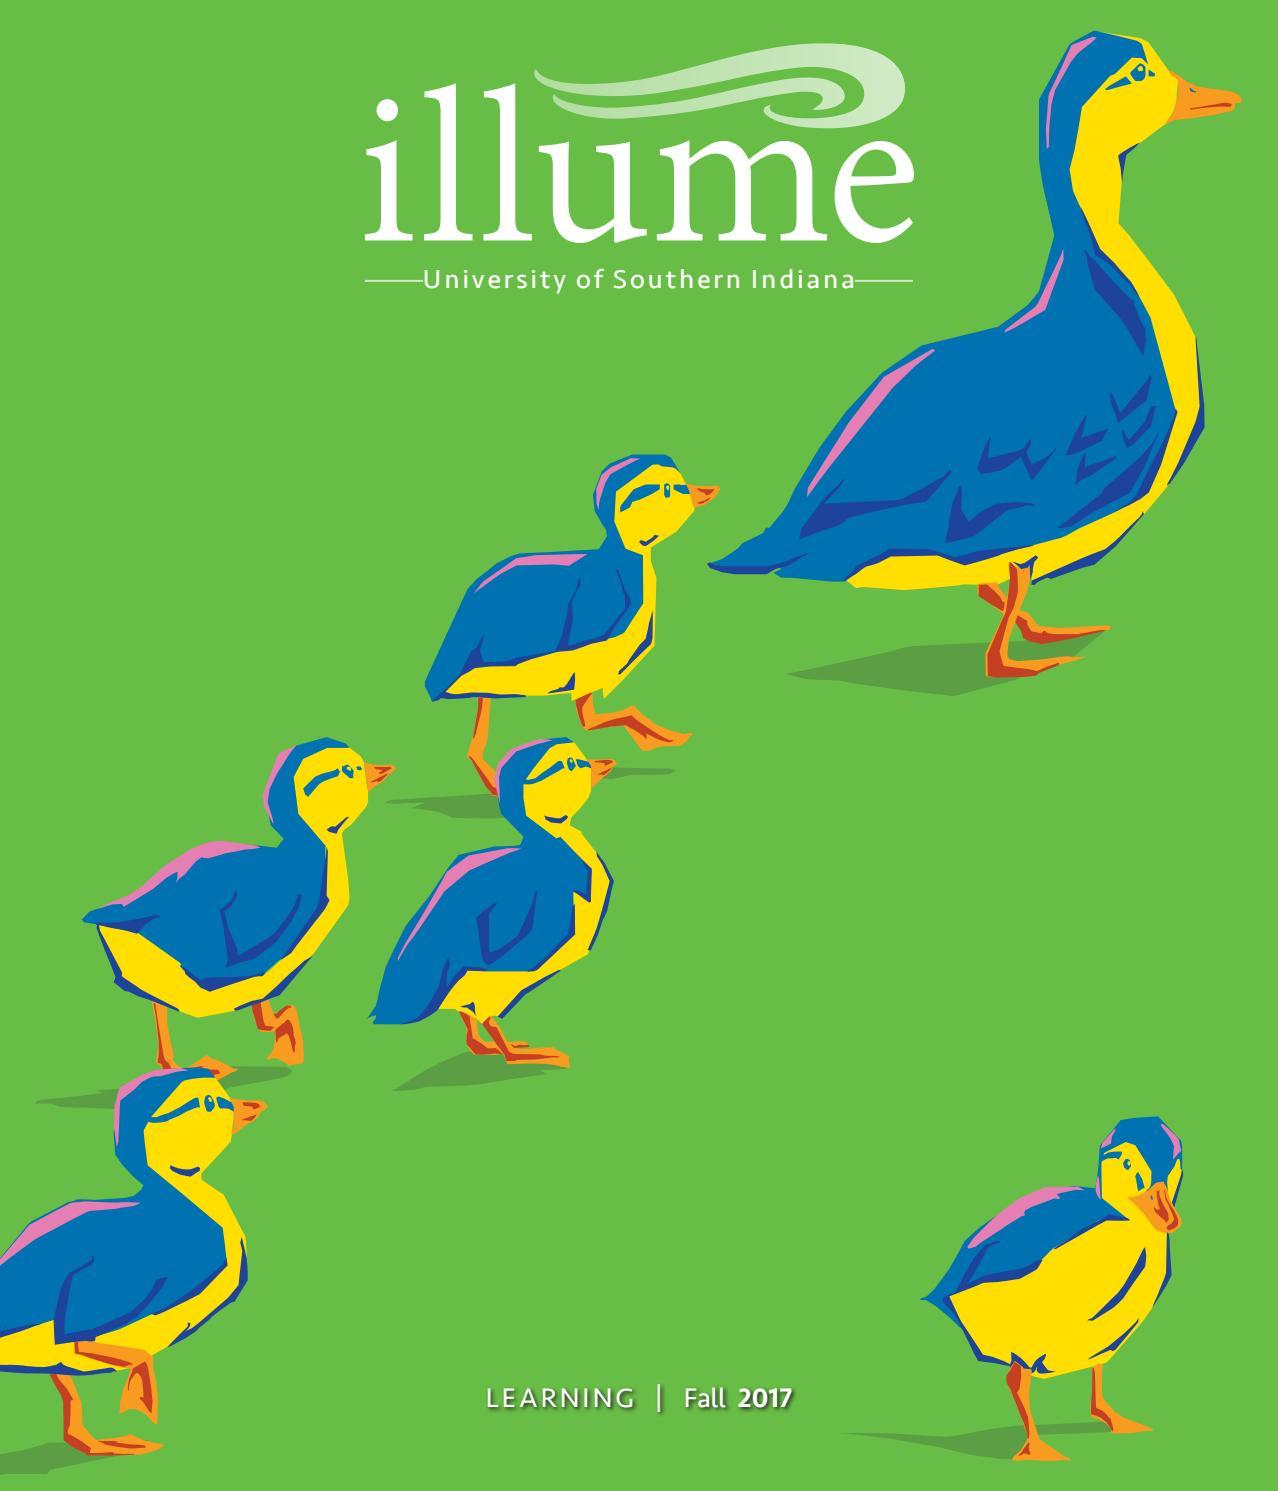 illume Fall 2017 by University of Southern Indiana - issuu